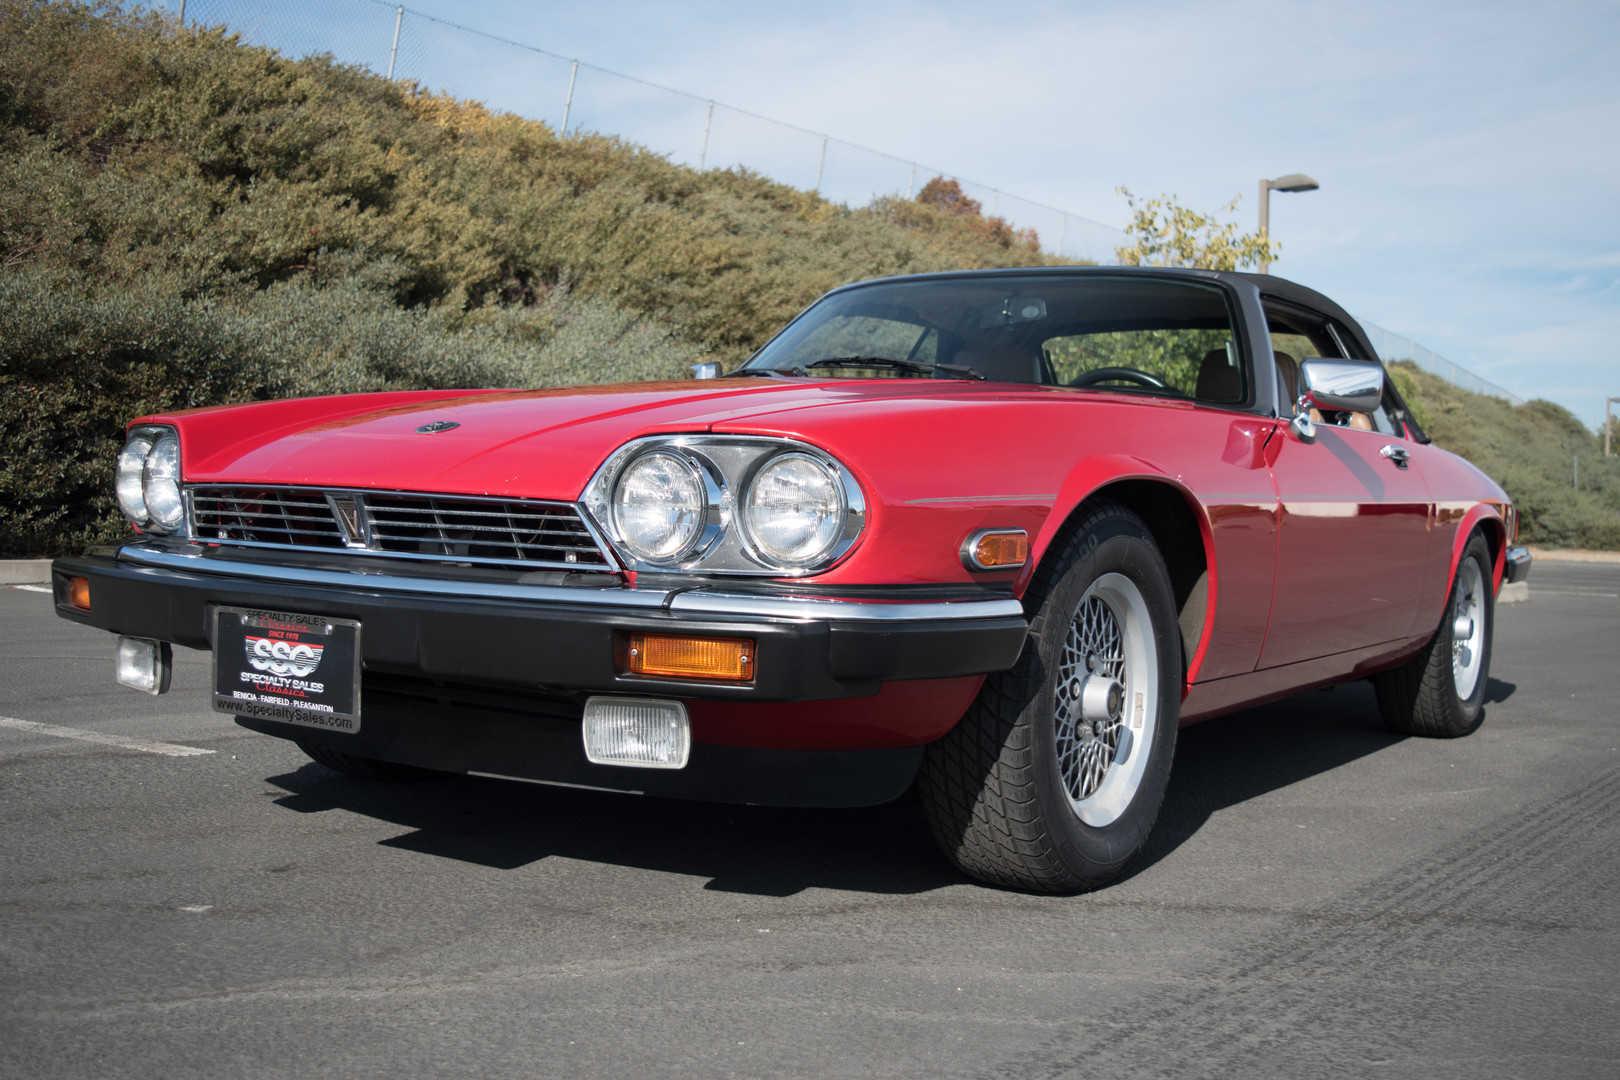 1989 Jaguar Xjs For Sale In Fairfield Ca Sajnv4840kc155575